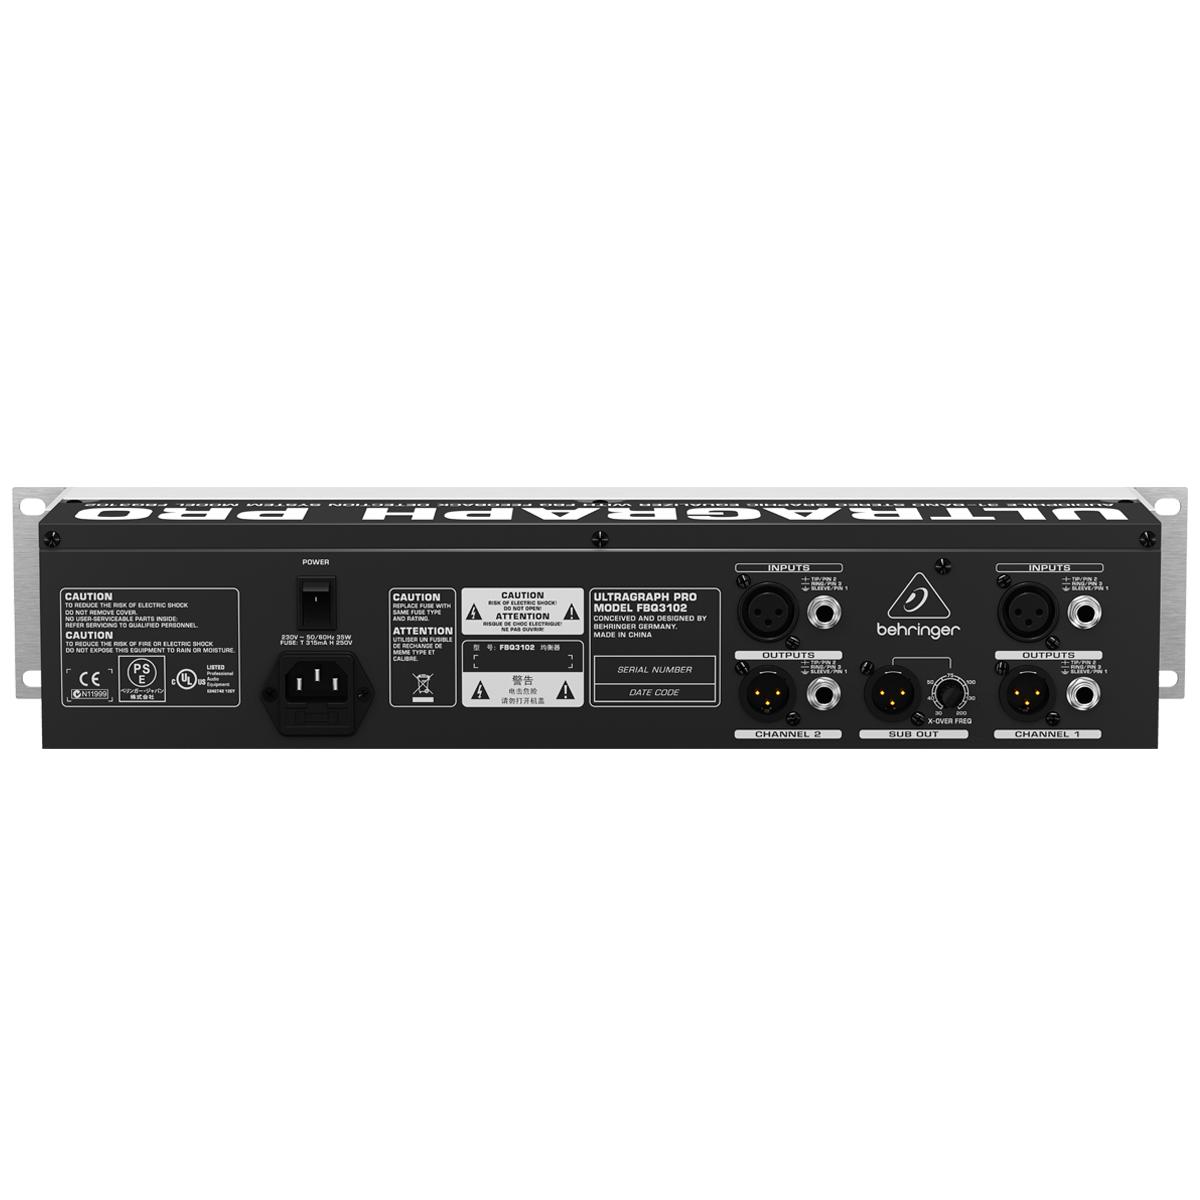 FBQ3102 - Equalizador Gr�fico 31 Bandas Ultragraph PRO FBQ 3102 - Behringer